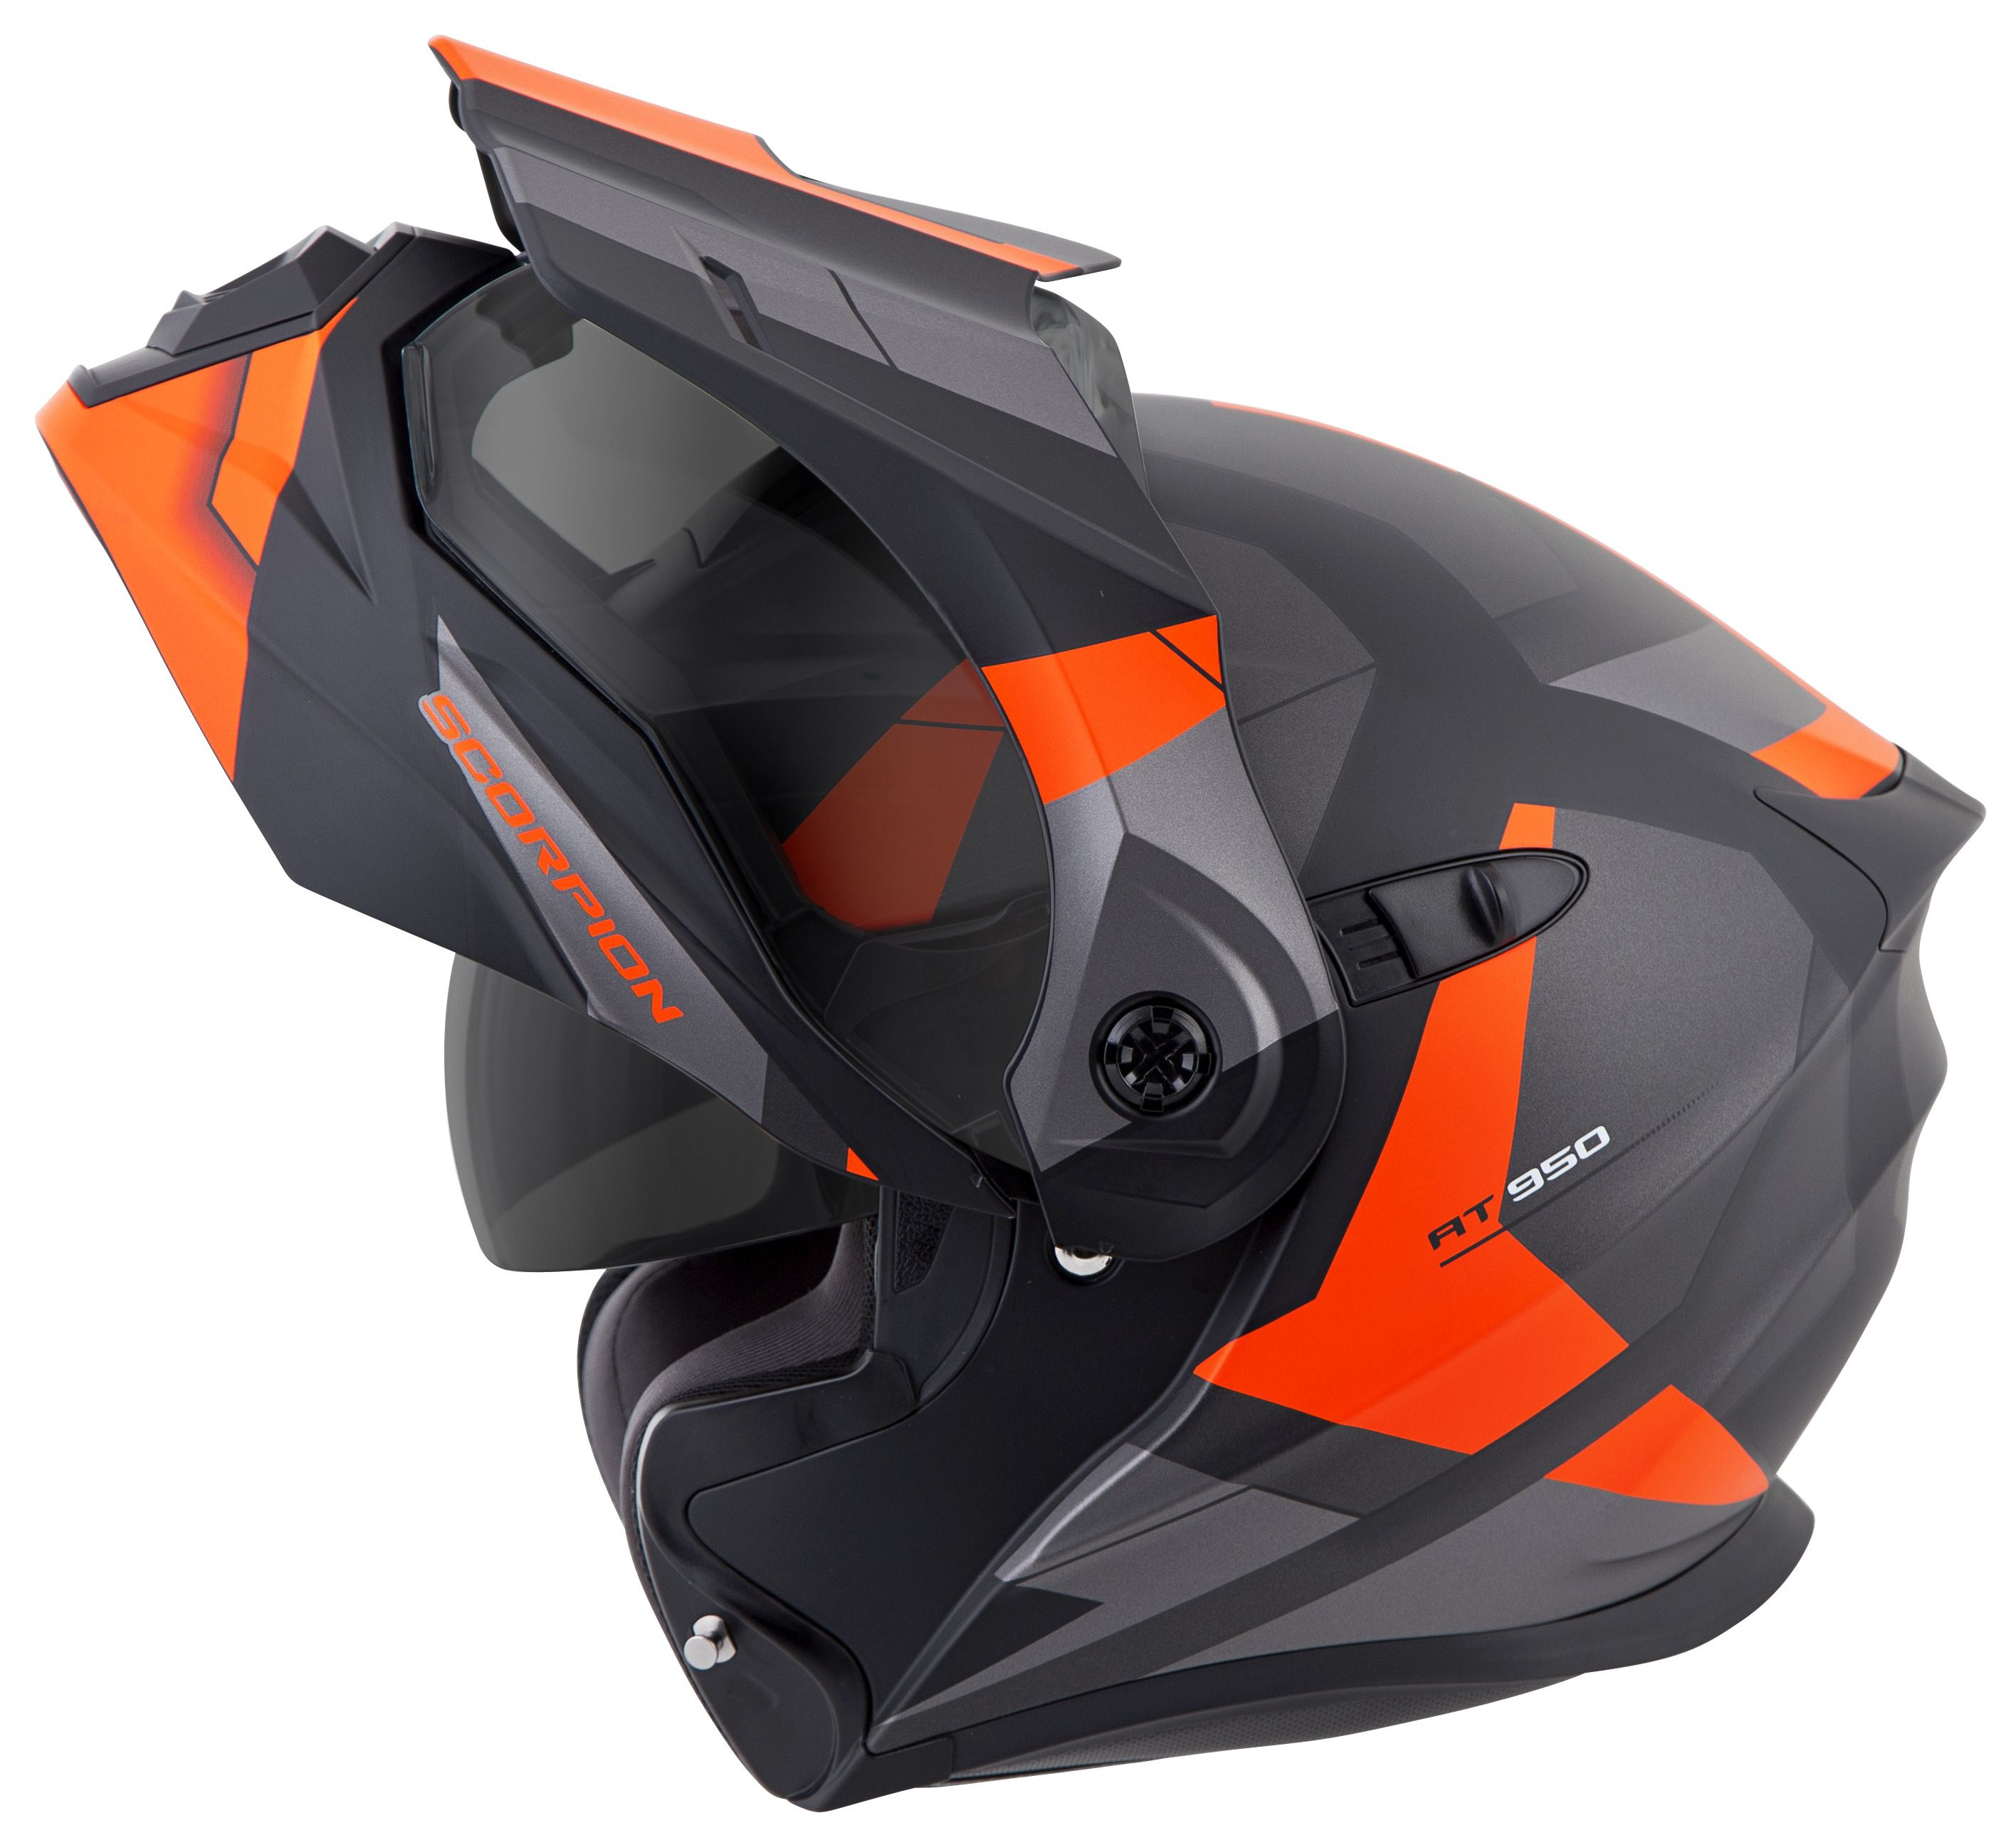 Sedici Avventura Carbon Helmet - Cycle Gear